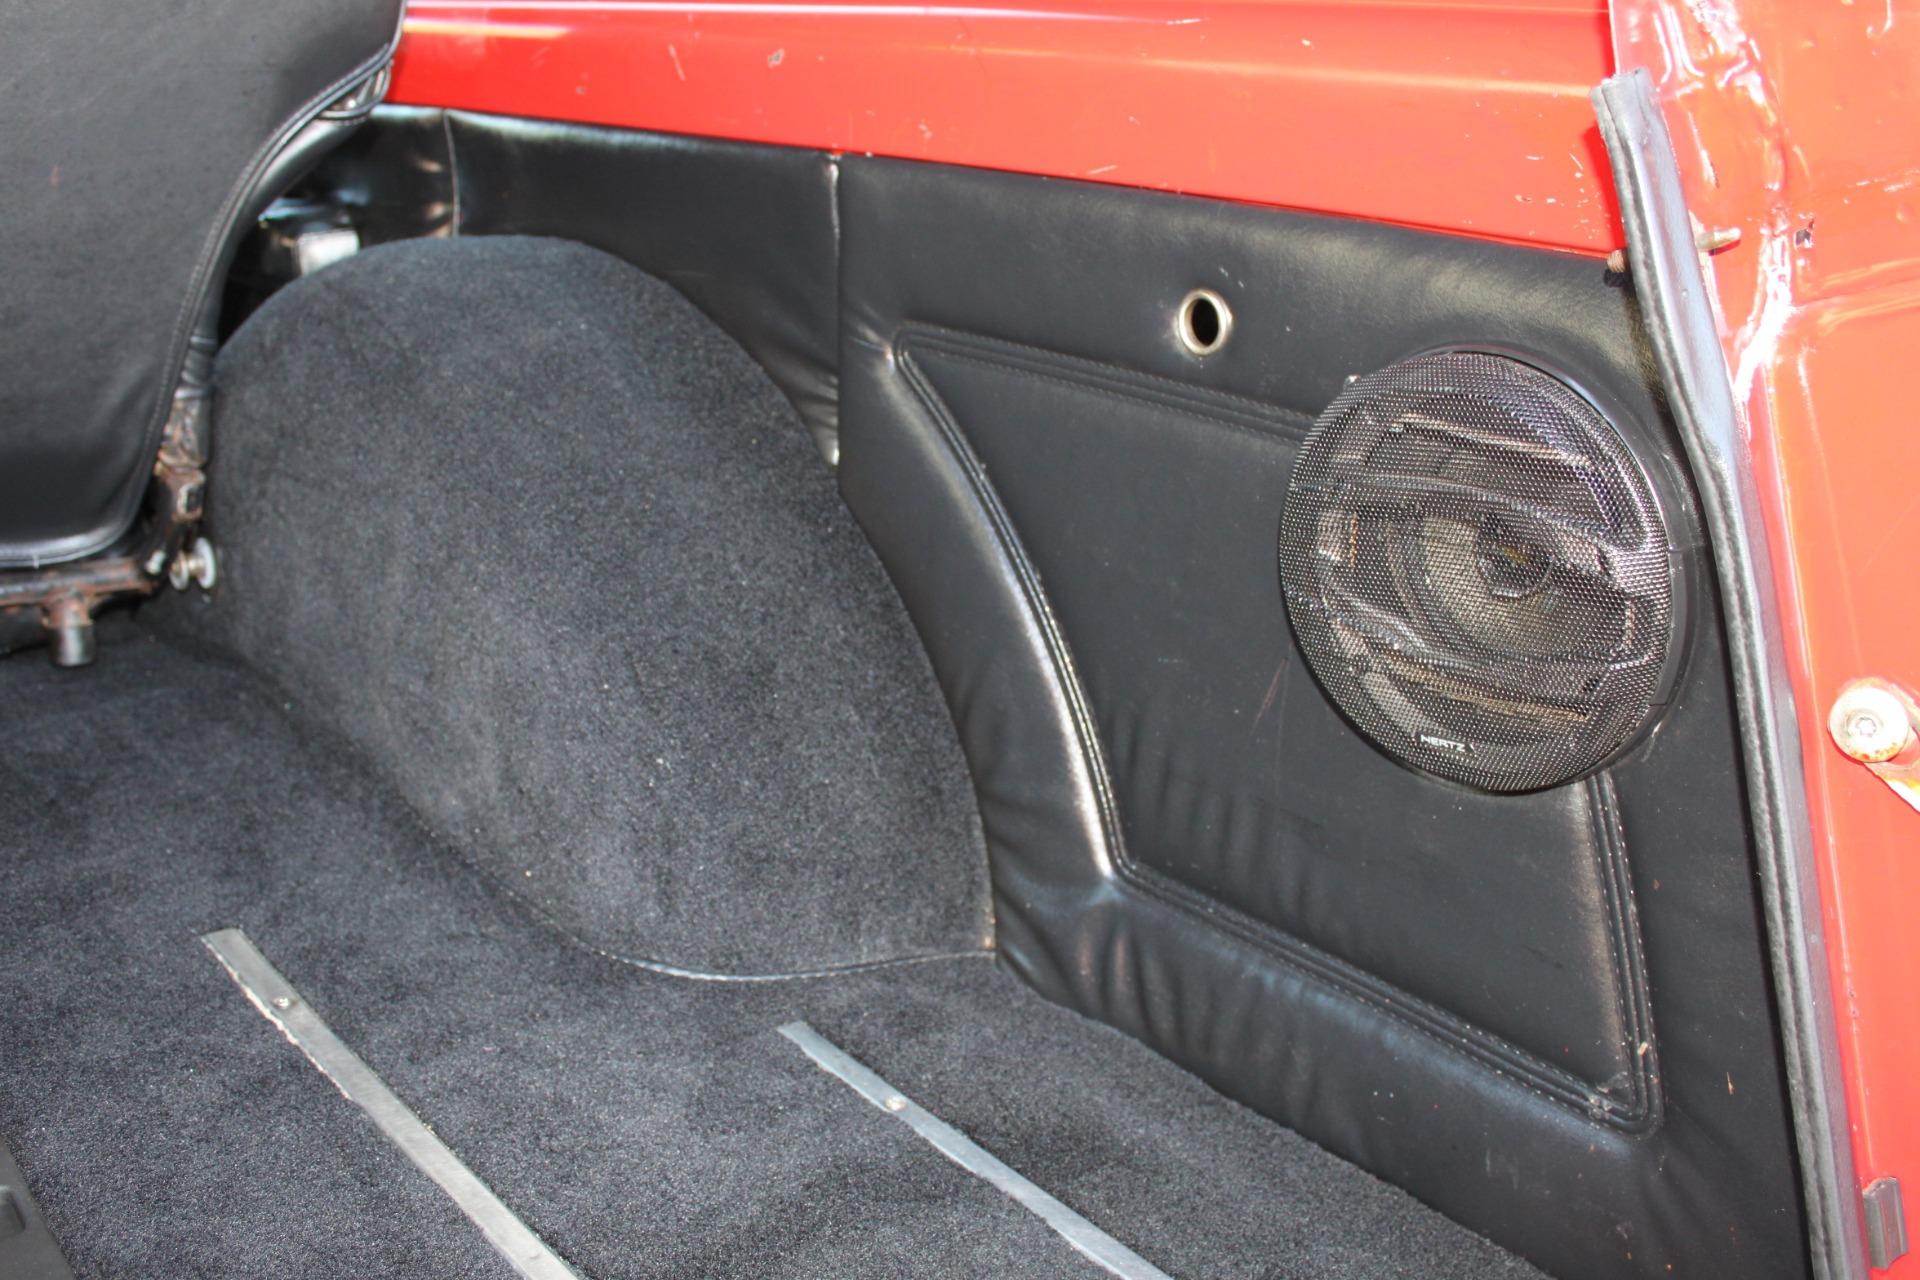 Used-1983-Jeep-Cherokee-Chief-4WD-Mini